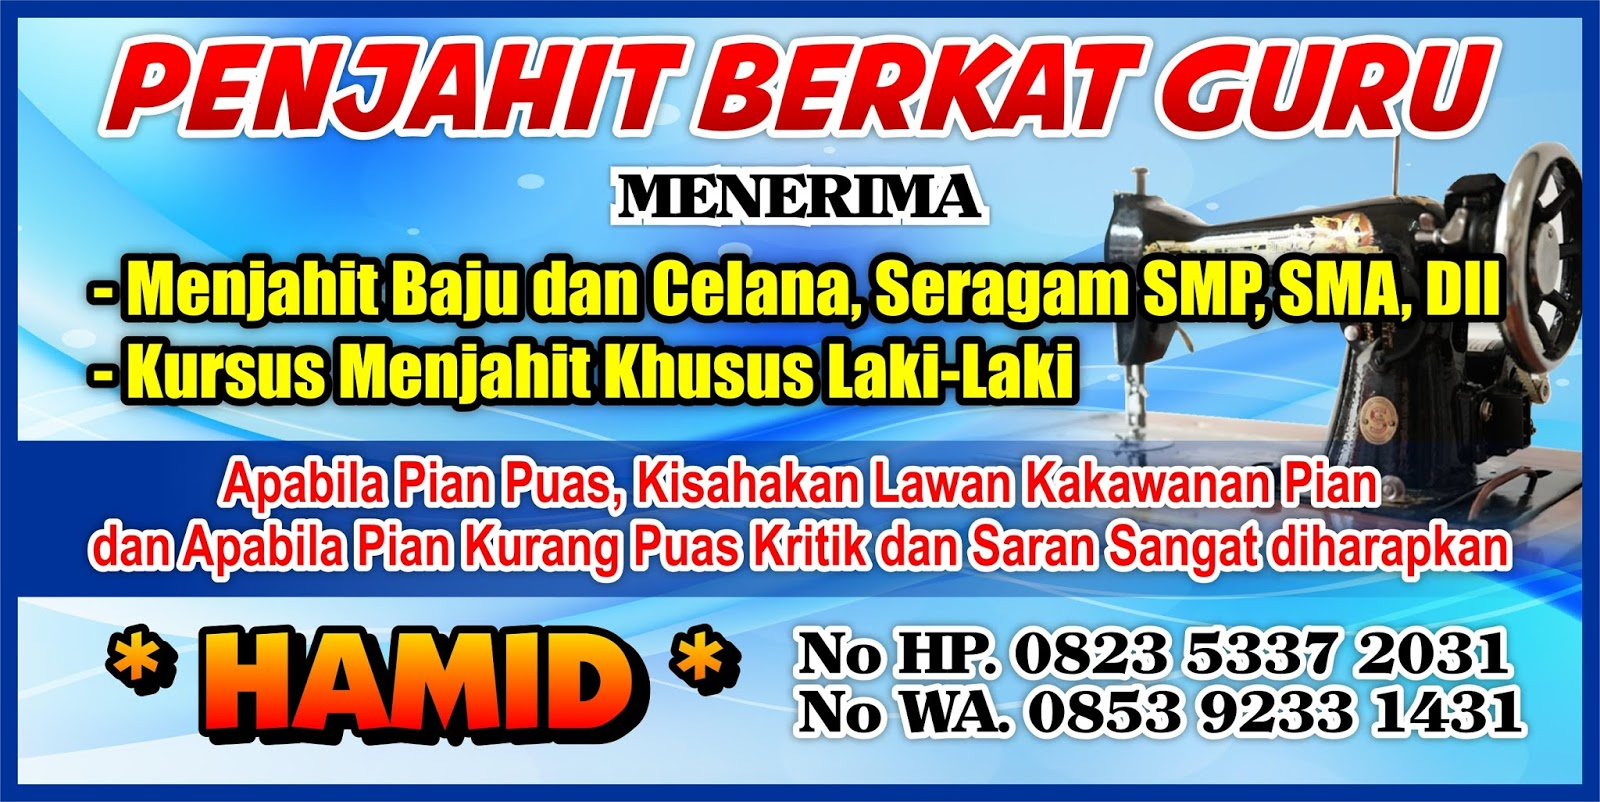 Contoh Desain Spanduk Muhammadiyah Jasa Desain Grafis ...